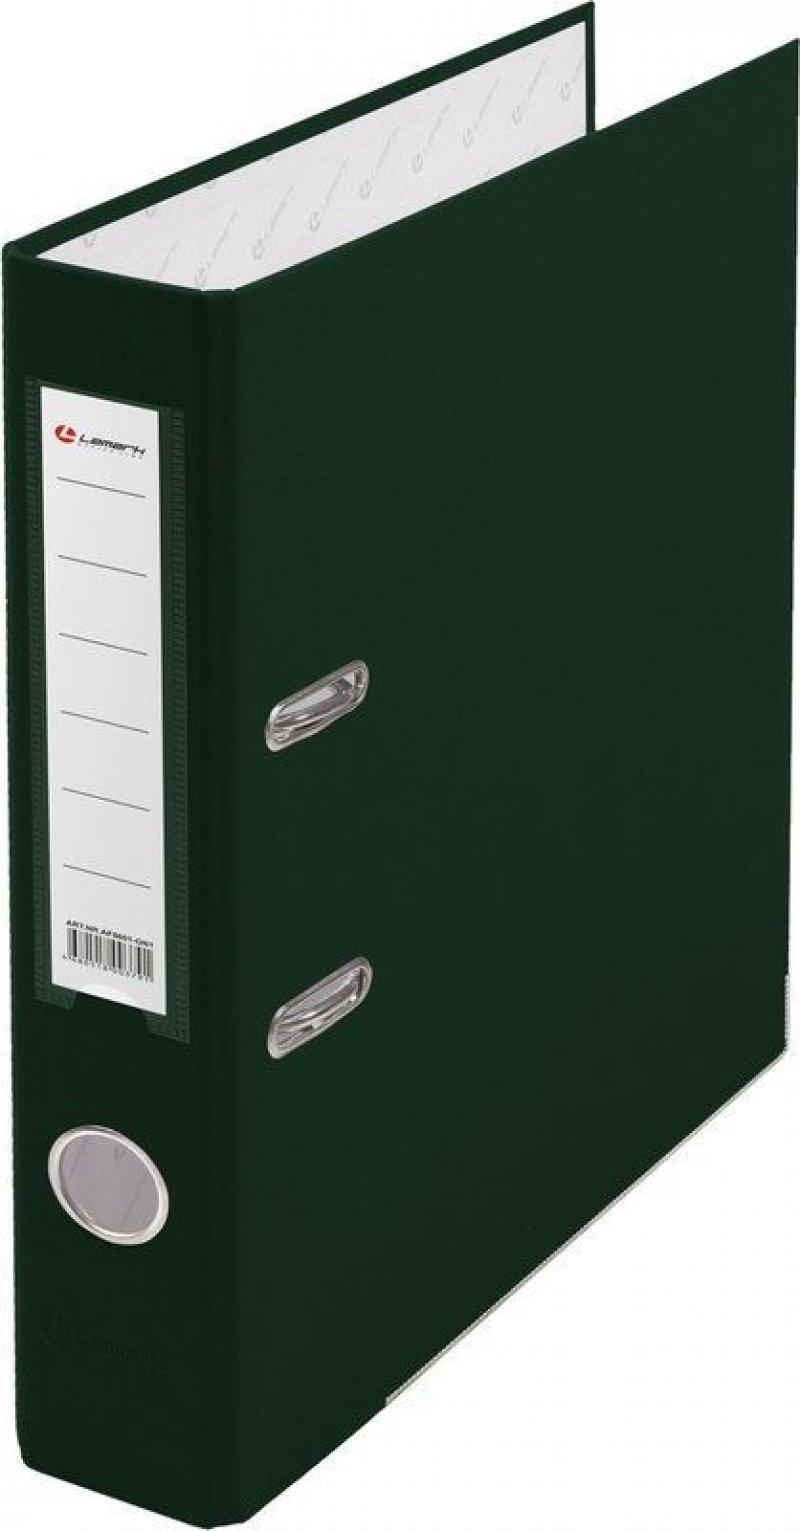 Папка-регистратор 50мм Lamark бумвинил карман зеленый металл